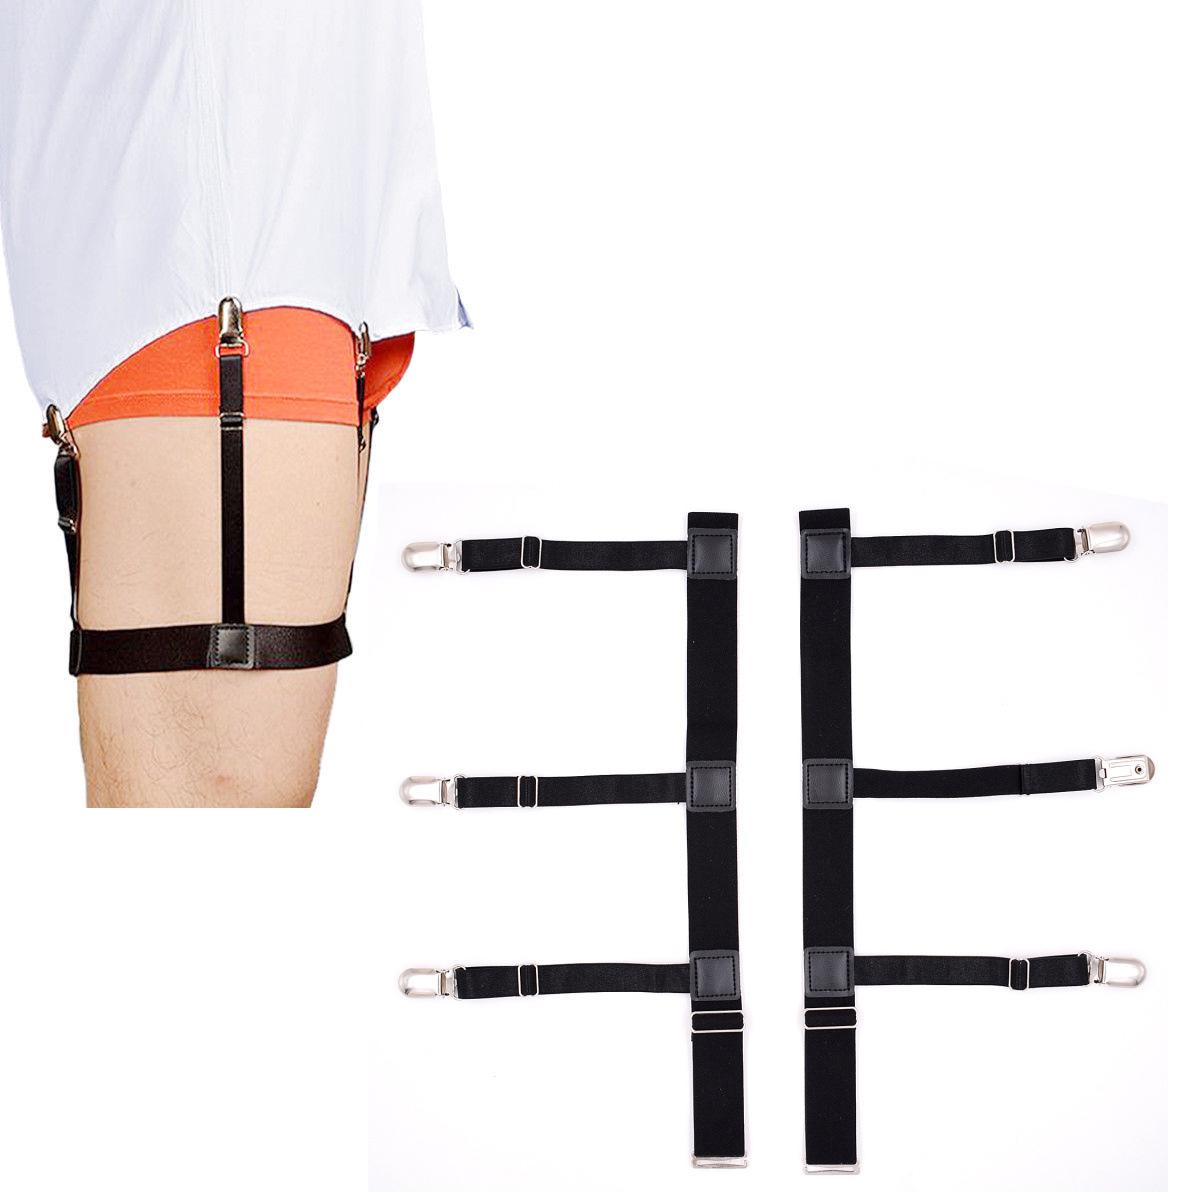 Apparel Accessories Provided Mens Shirt Crease-resist Anti-skid Clip Legs Thigh Elastic Adjustable Suspender Holder Stays Garters For Gentlemen A30 Men's Suspenders